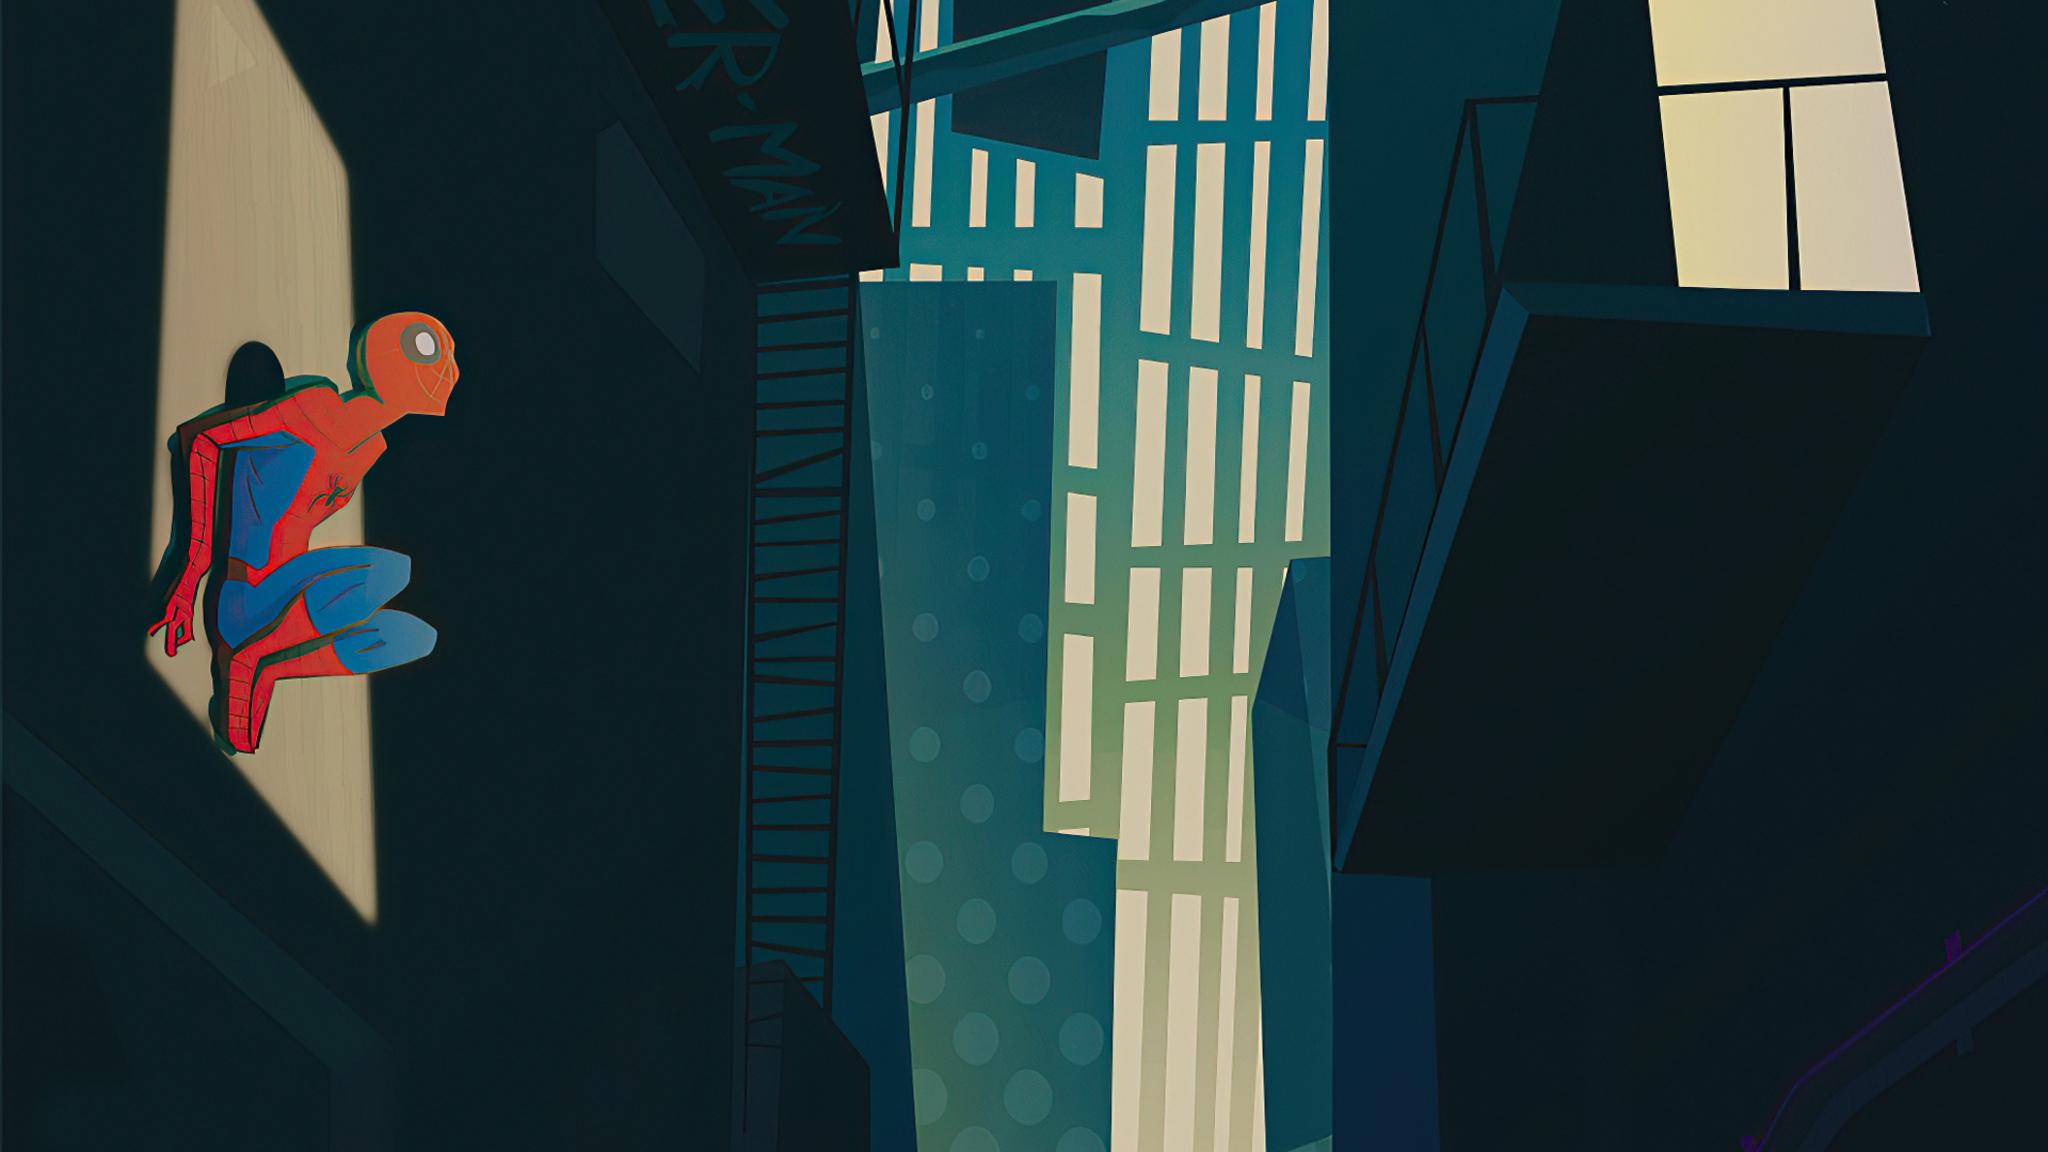 spiderman-looking-through-window-zp.jpg